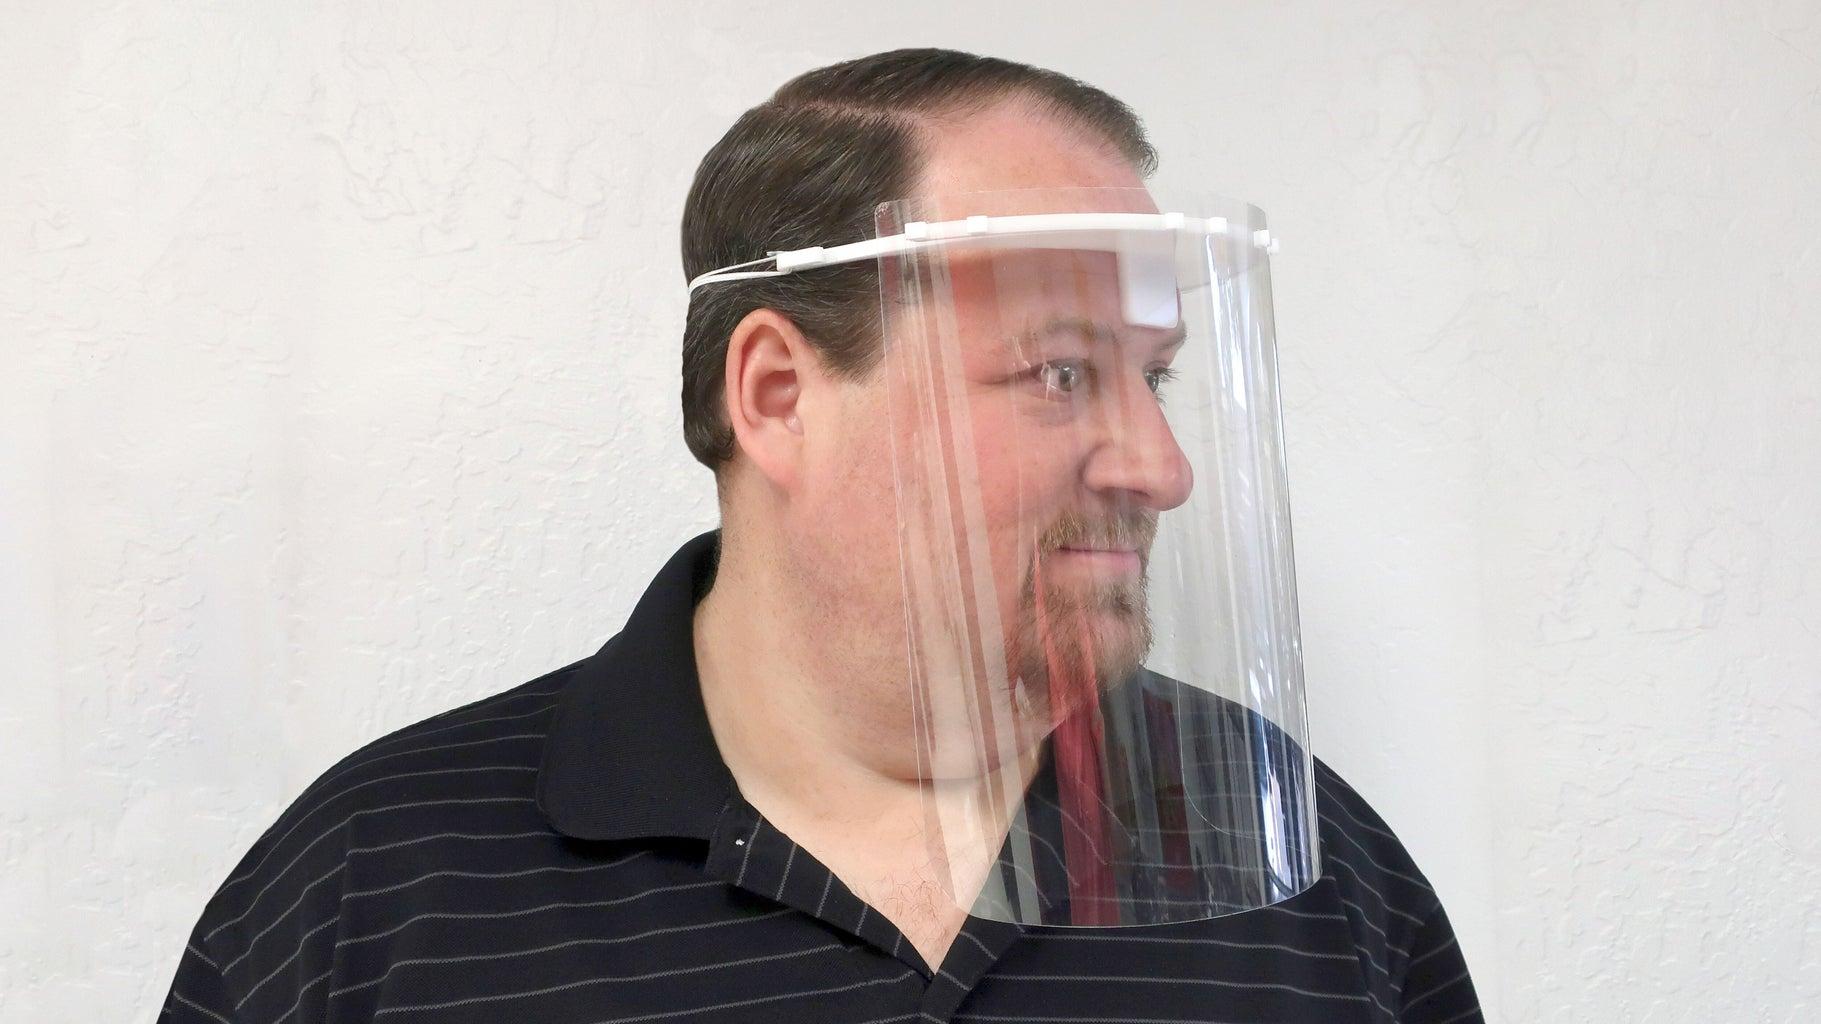 Assemble the Face Shield